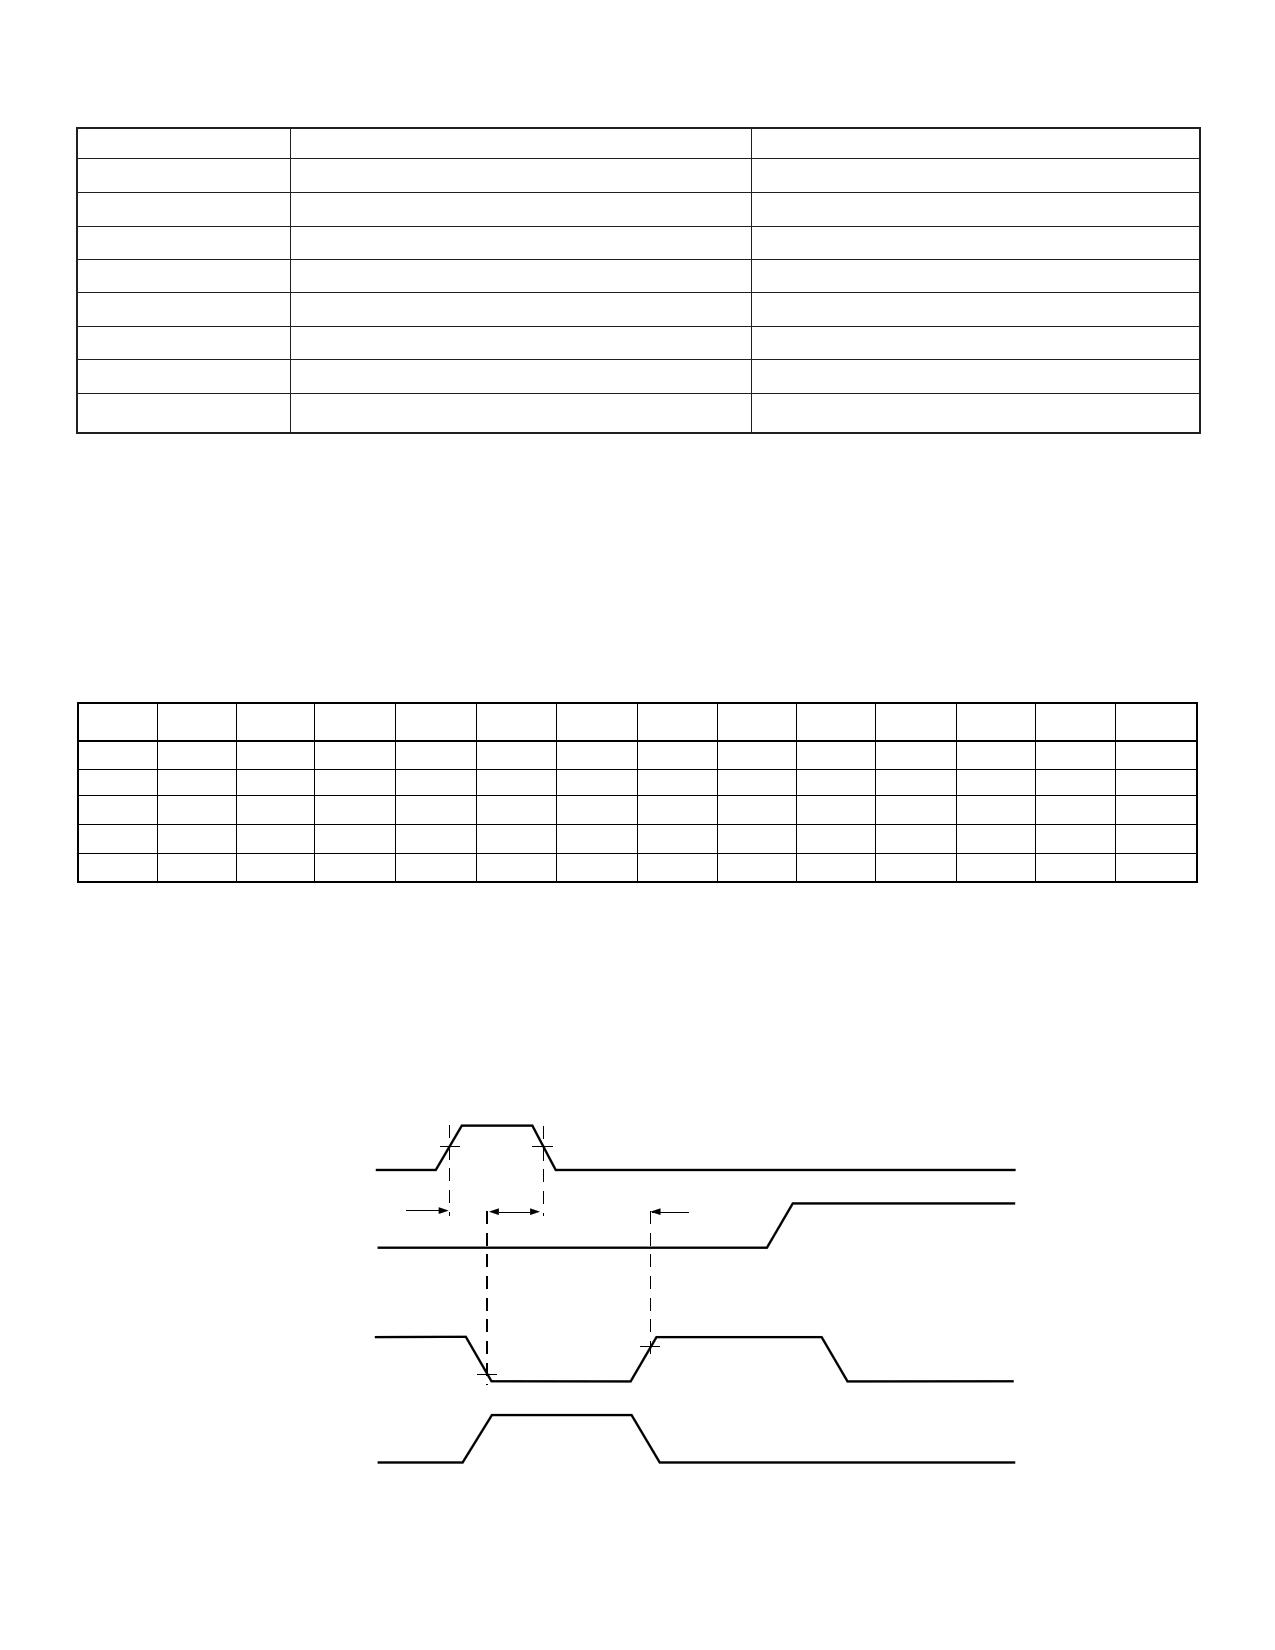 HV20720 pdf, ピン配列